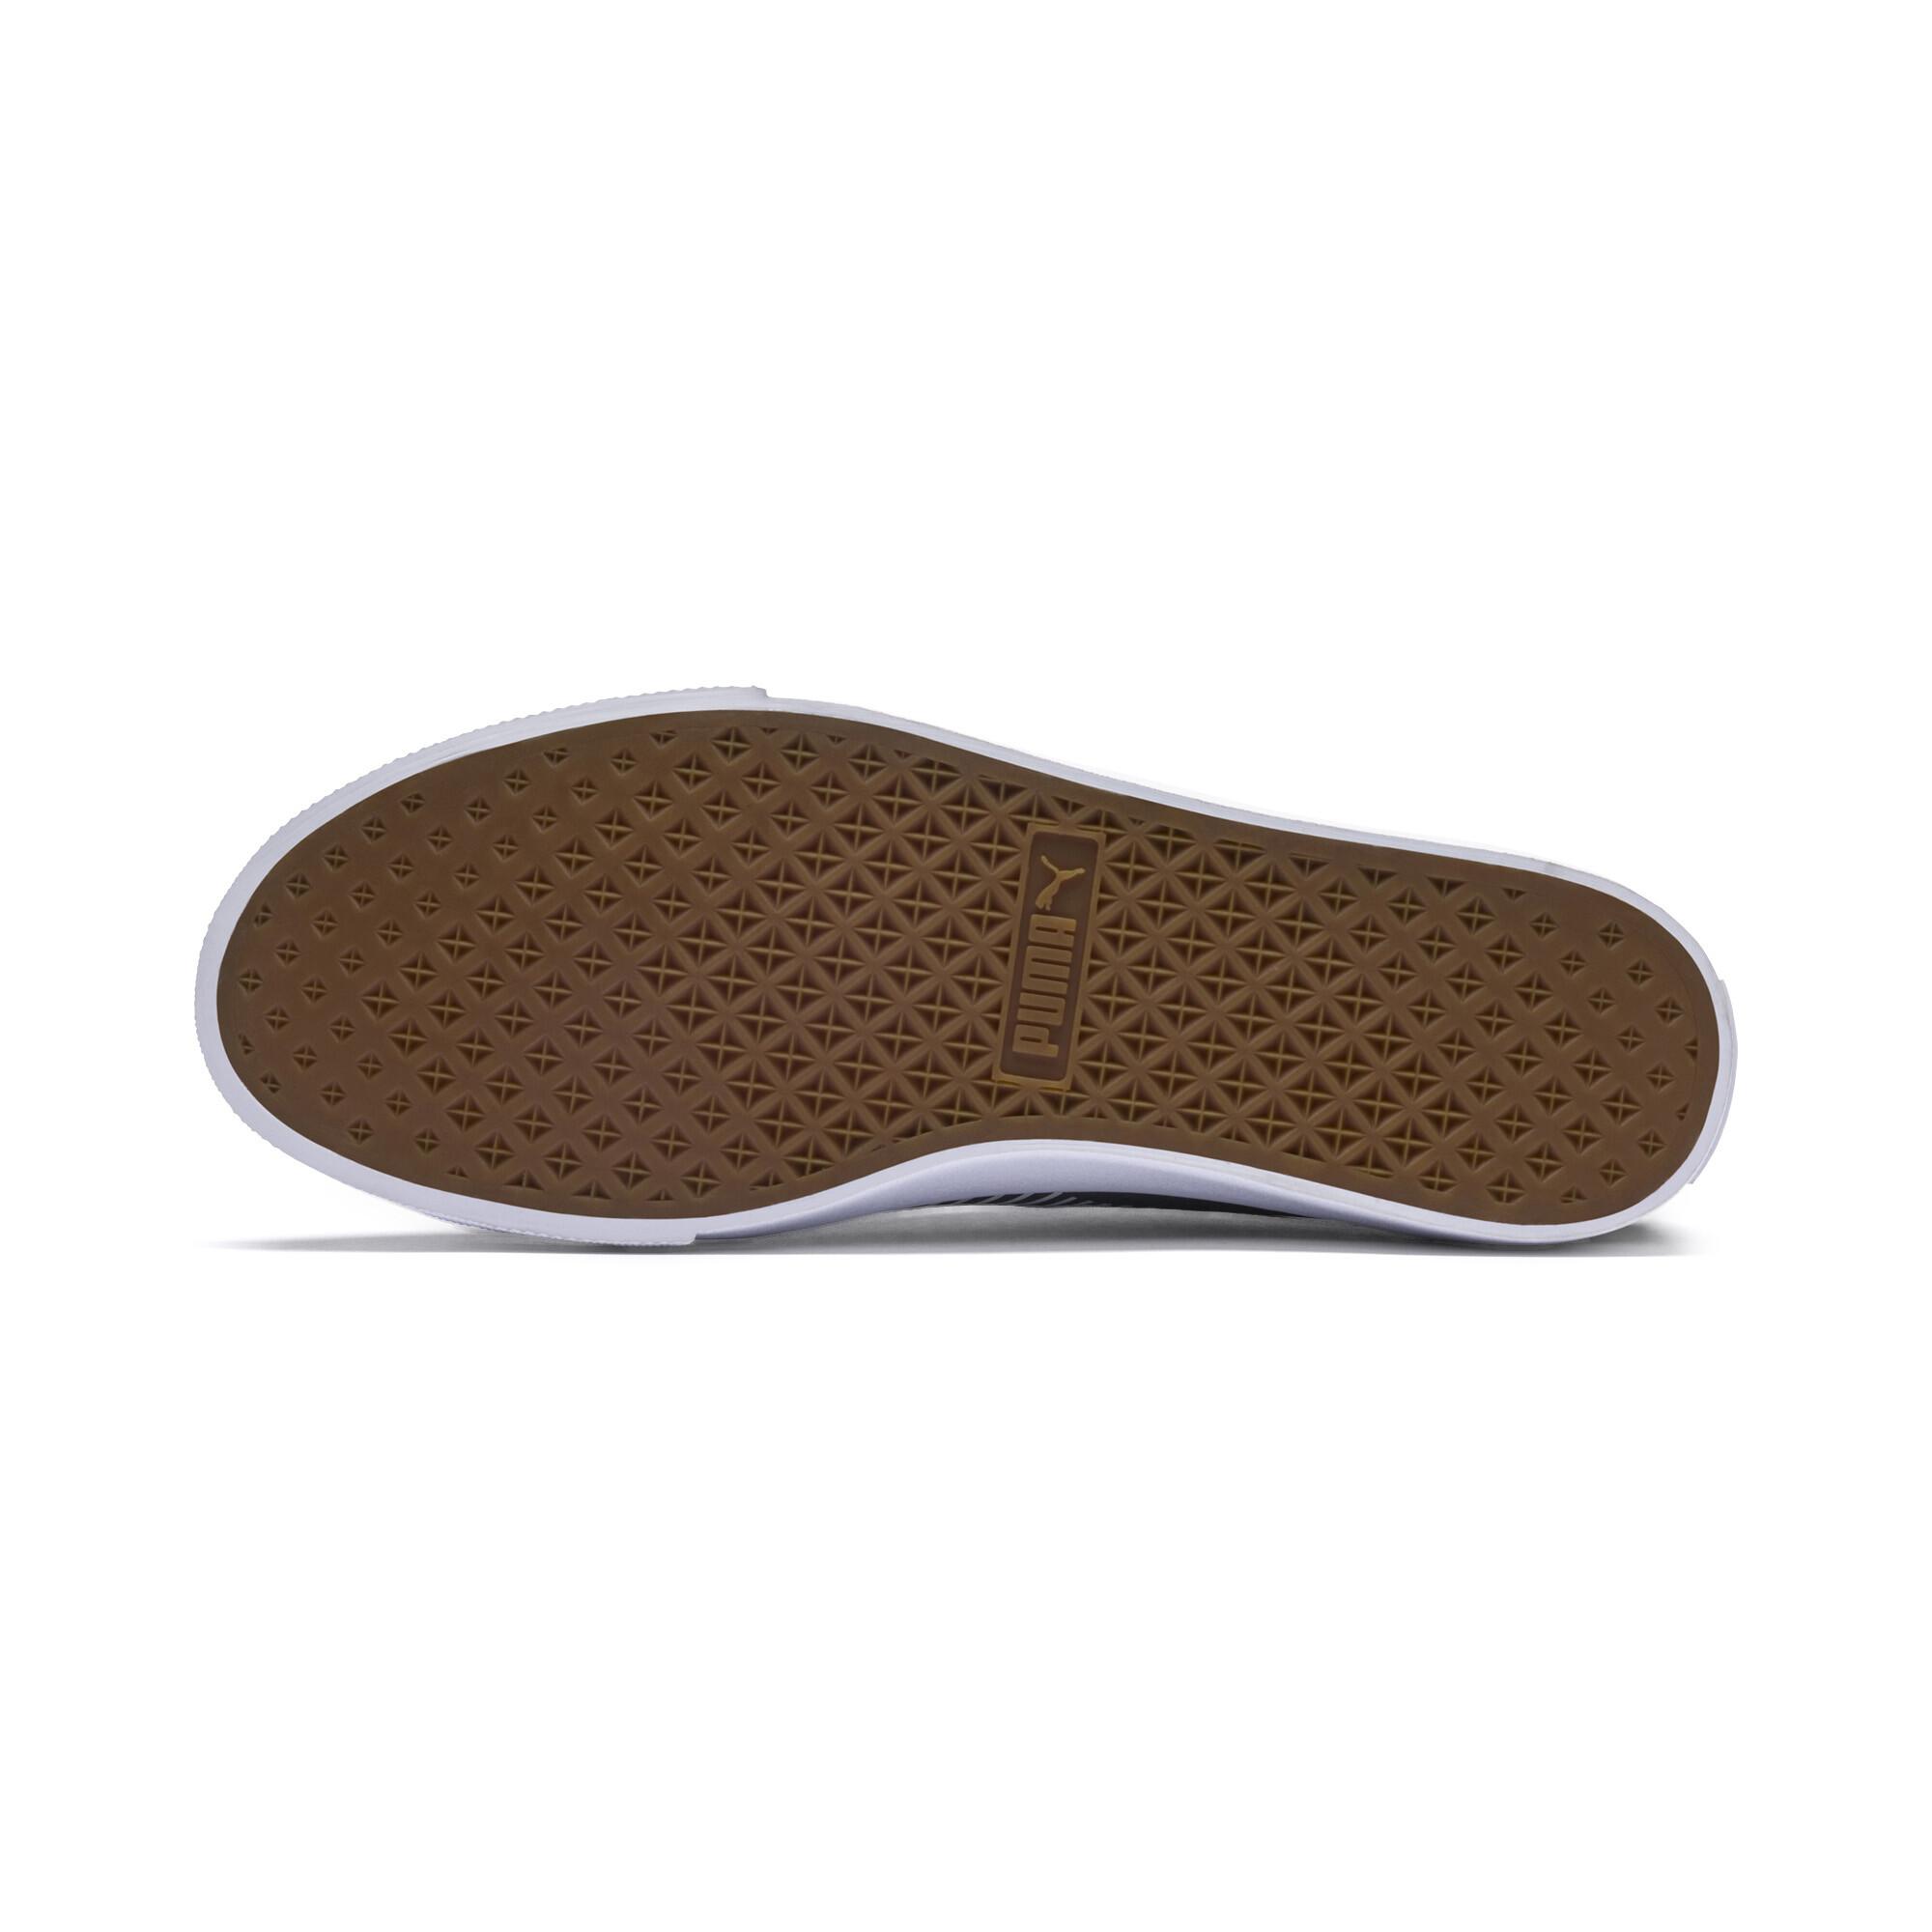 PUMA-Bari-Sneakers-Men-Shoe-Basics thumbnail 20